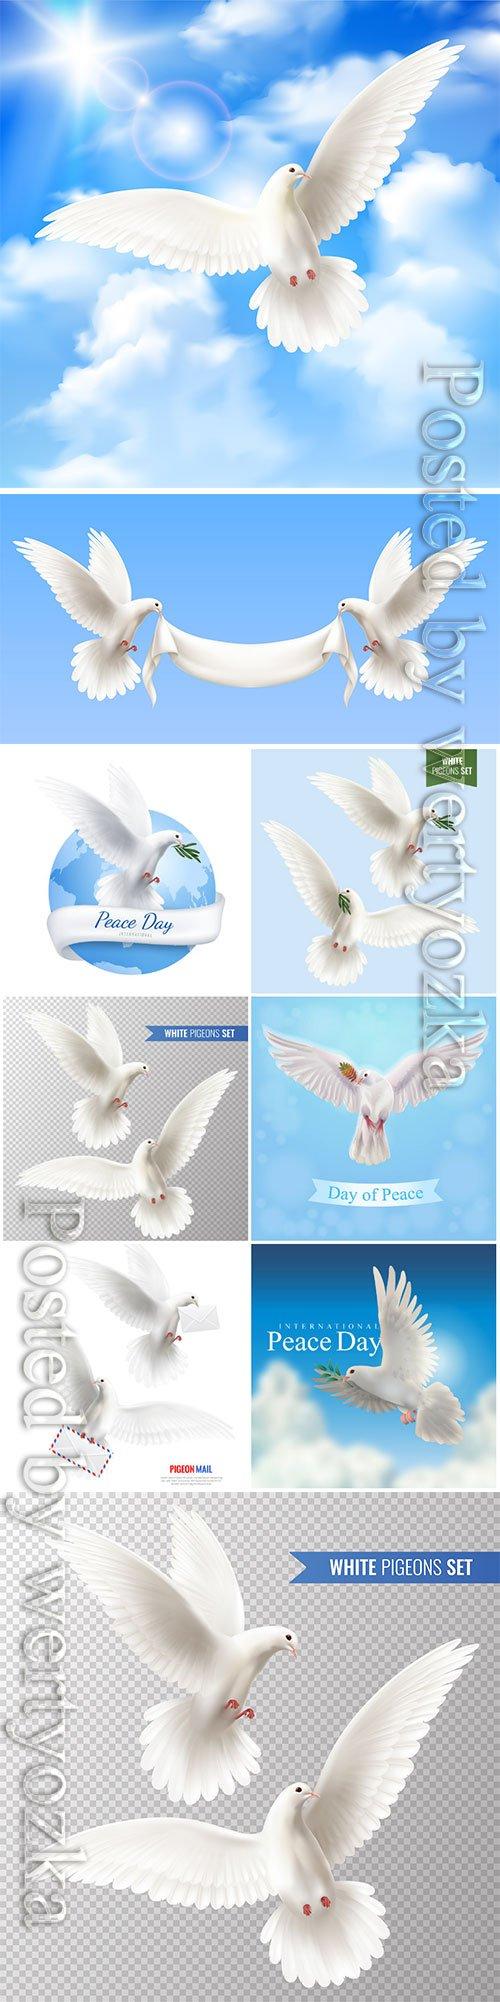 White pigeons vector set